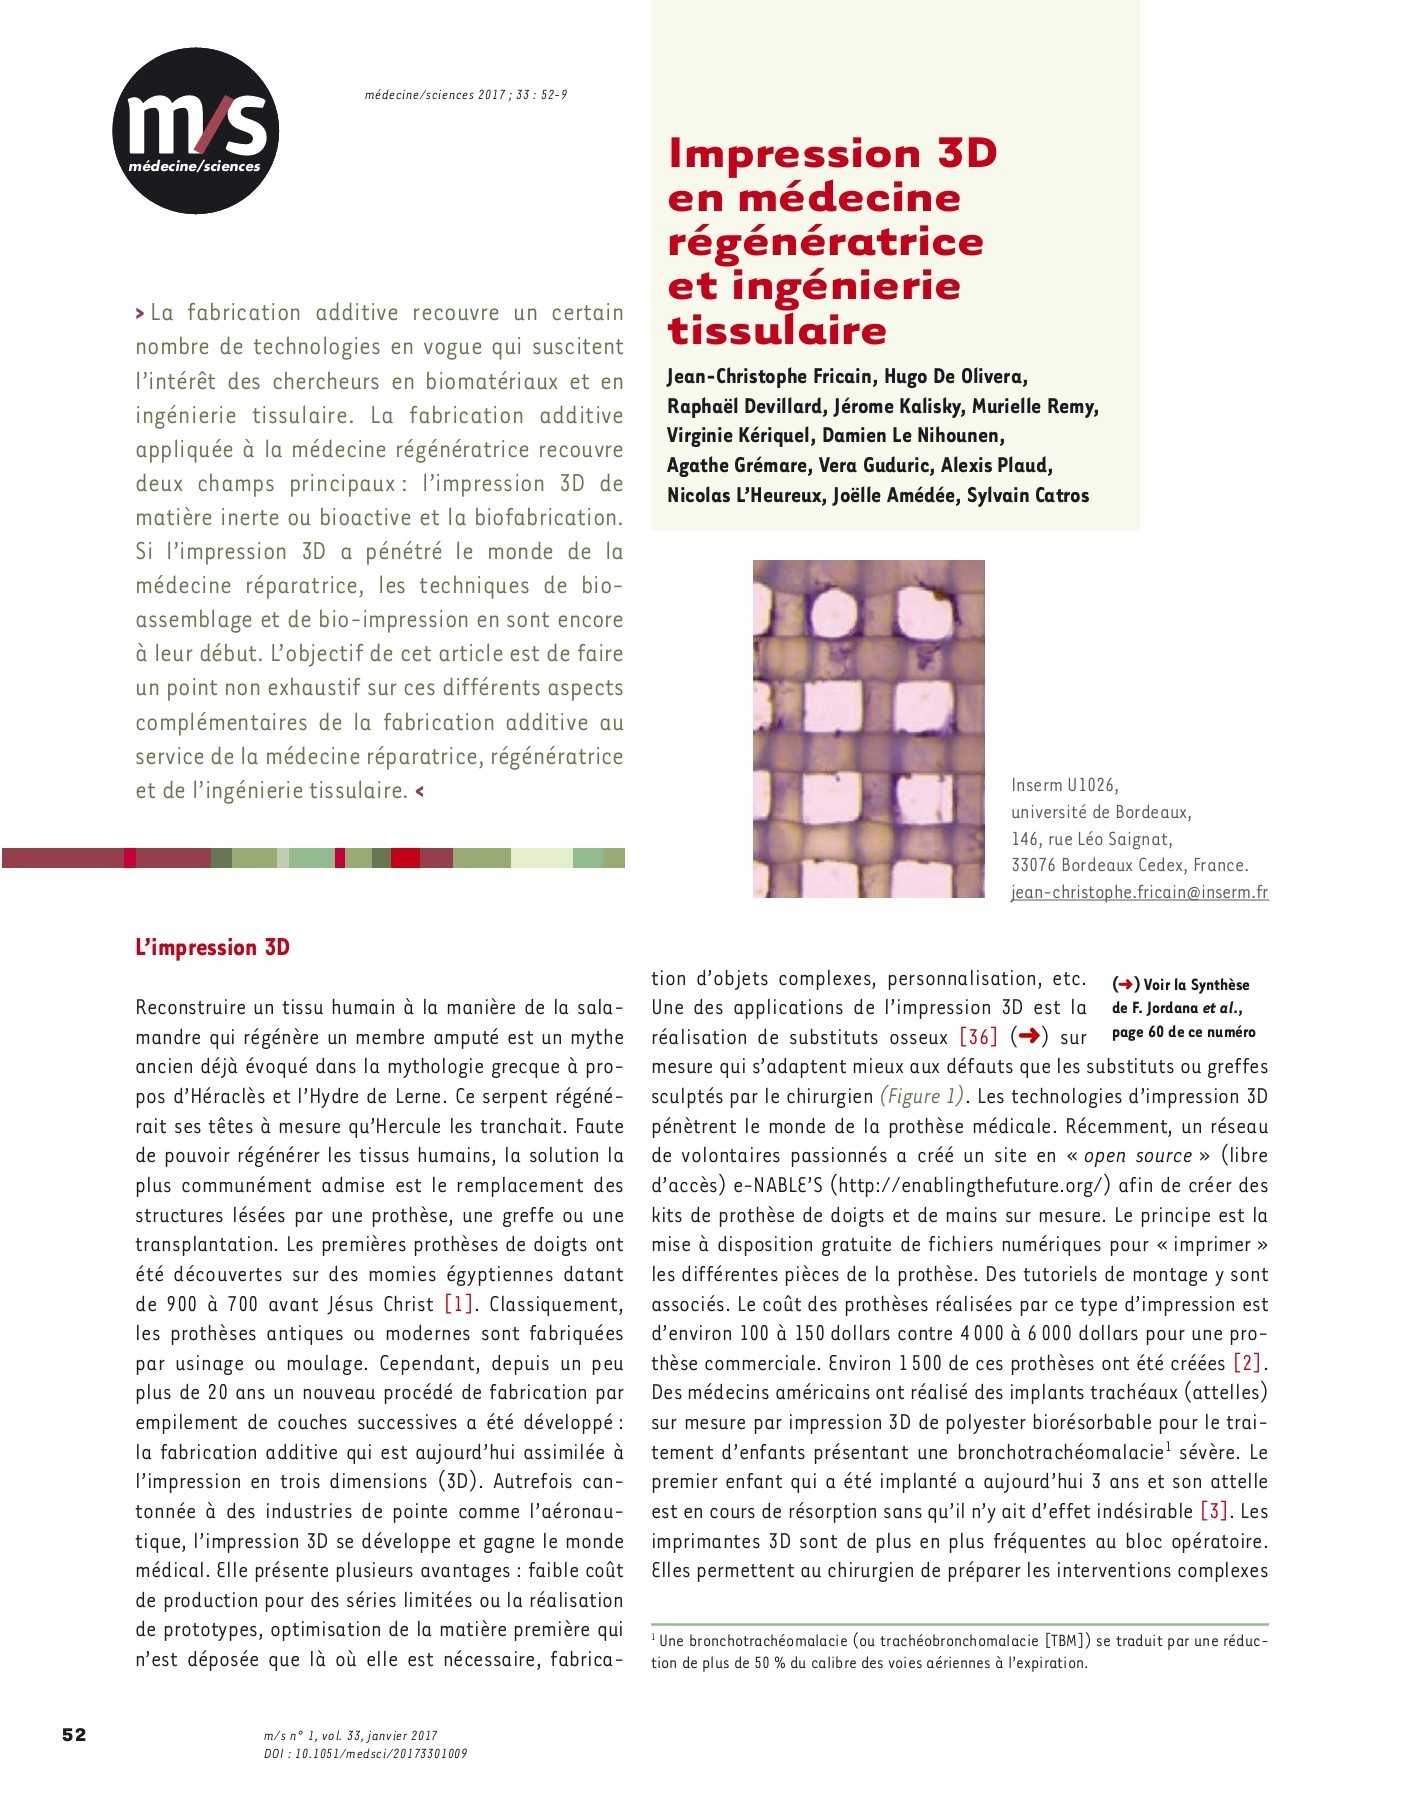 medecine sciences vol 33 n 1 janvier 2017 pages 51 100 text version fliphtml5